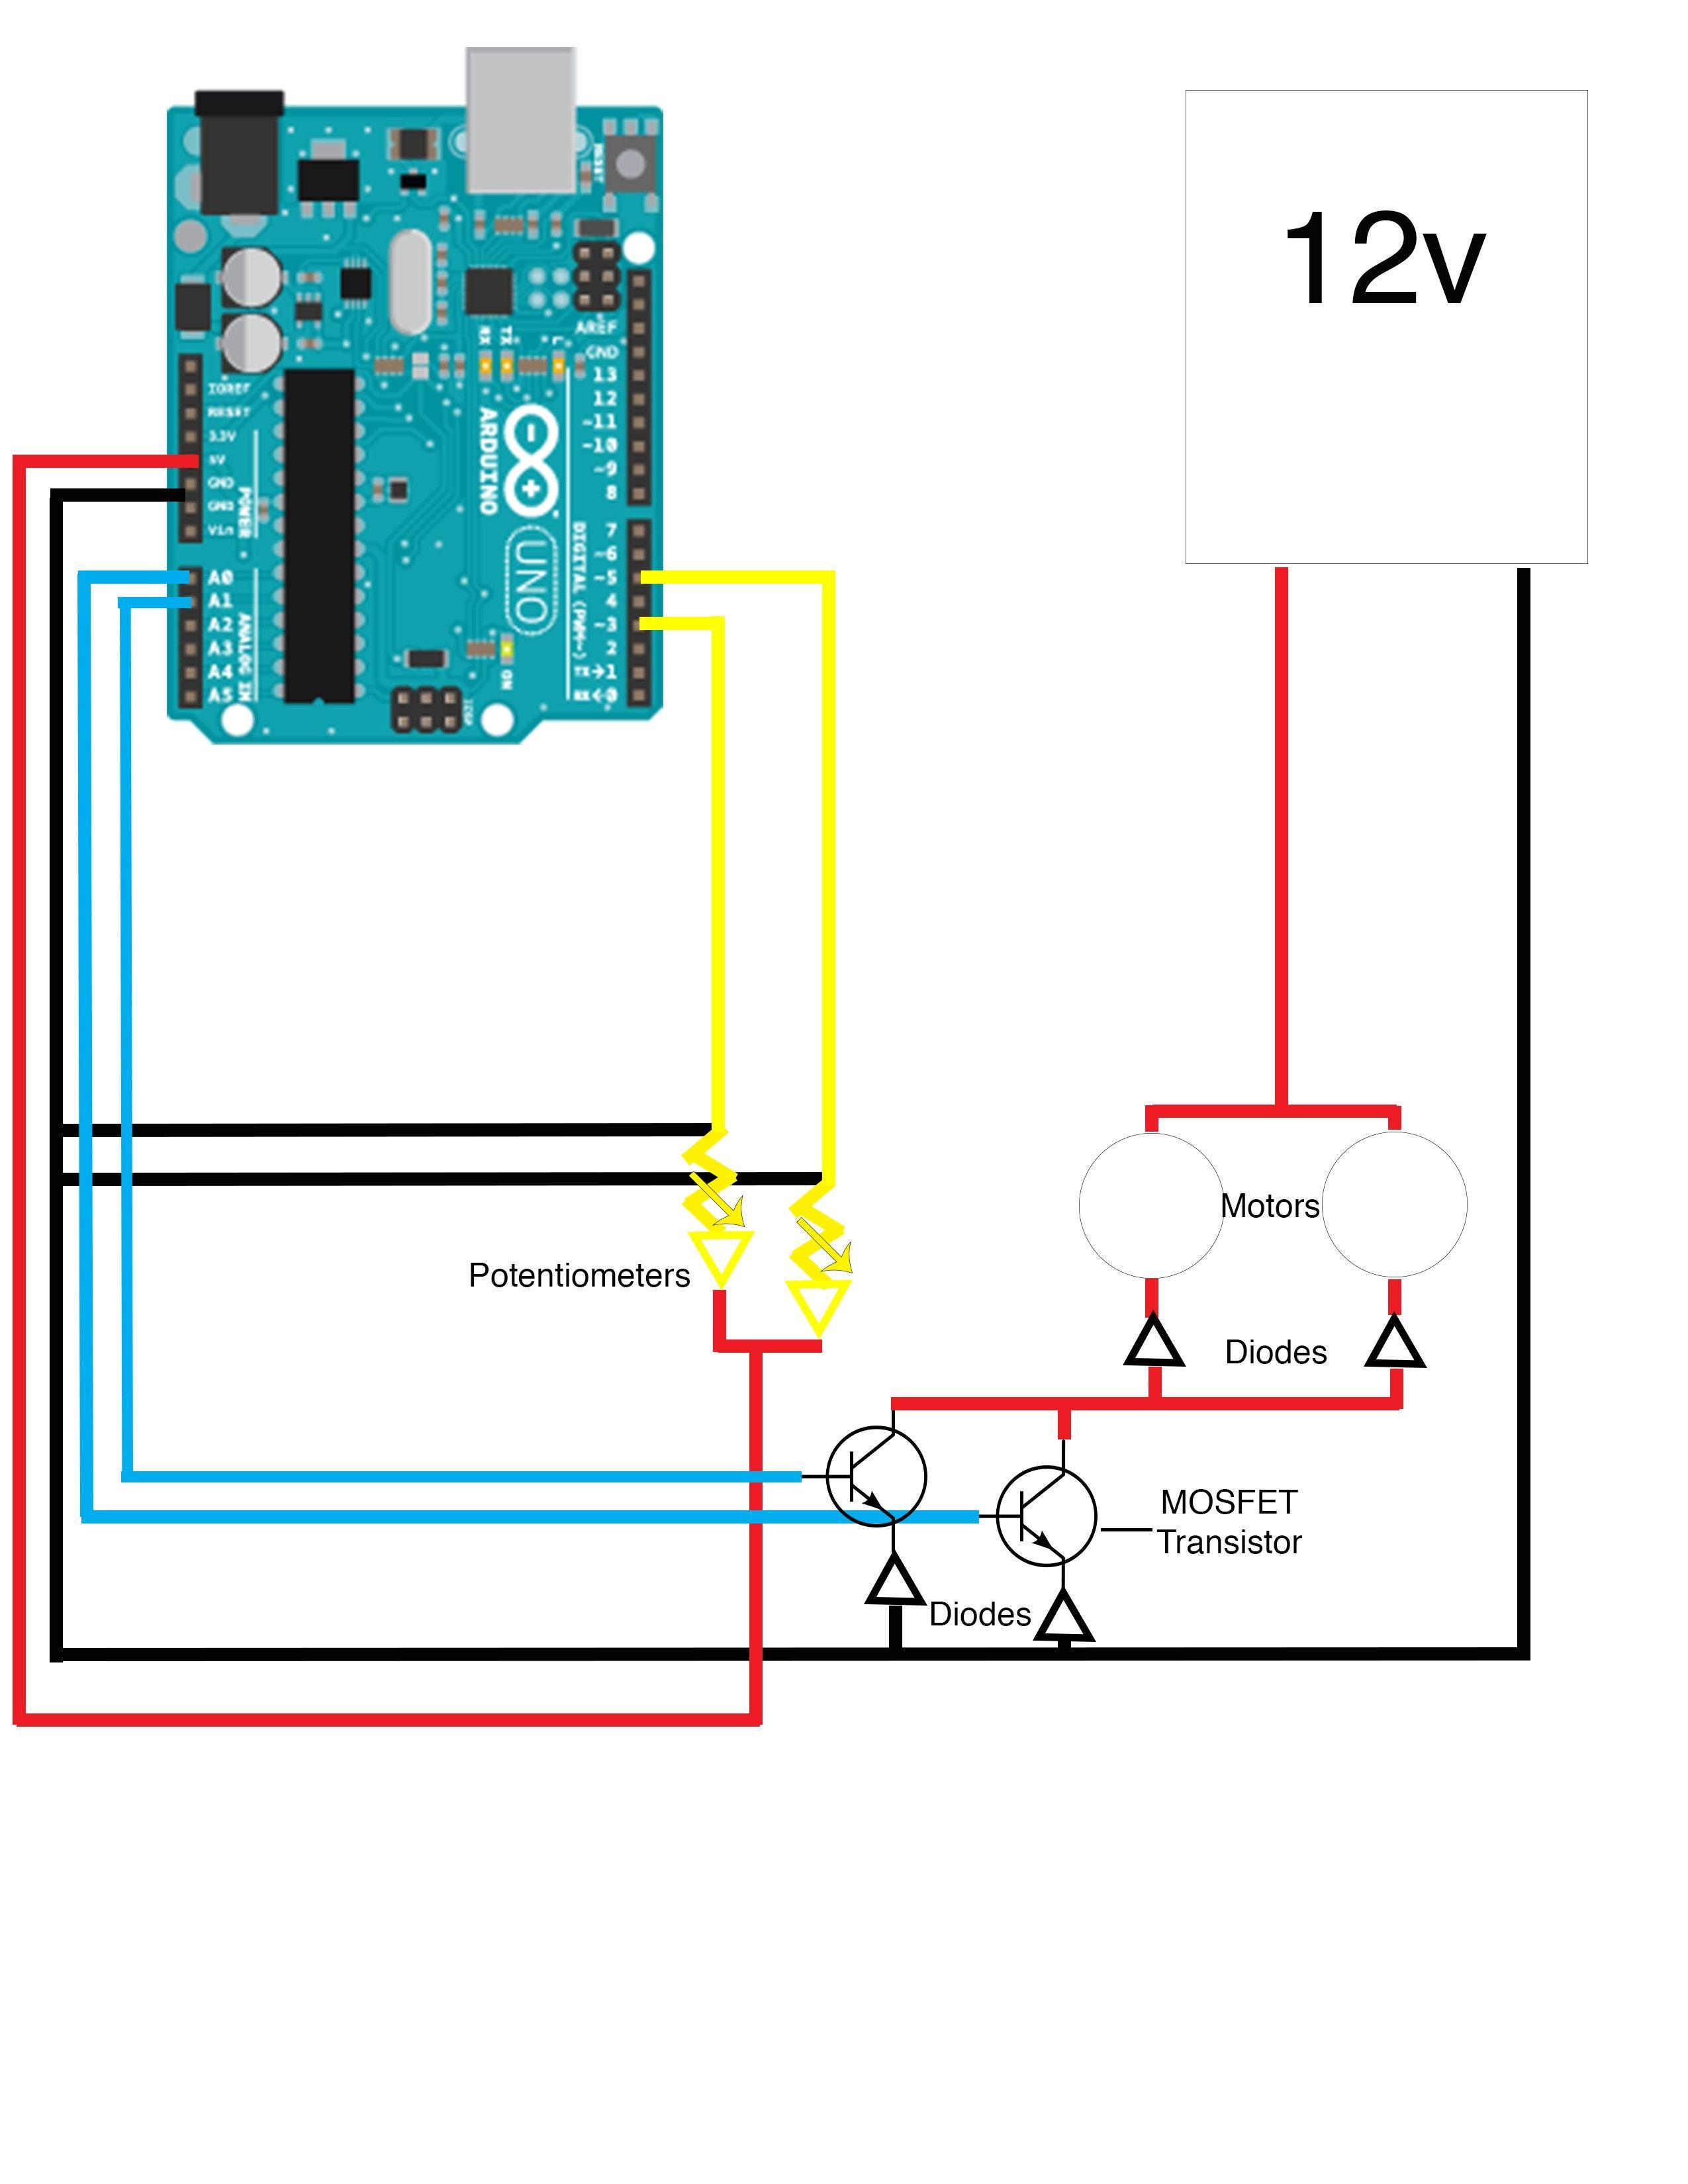 Awesome Wiring Diagram Potentiometer  Diagrams  Digramssample  Diagramimages